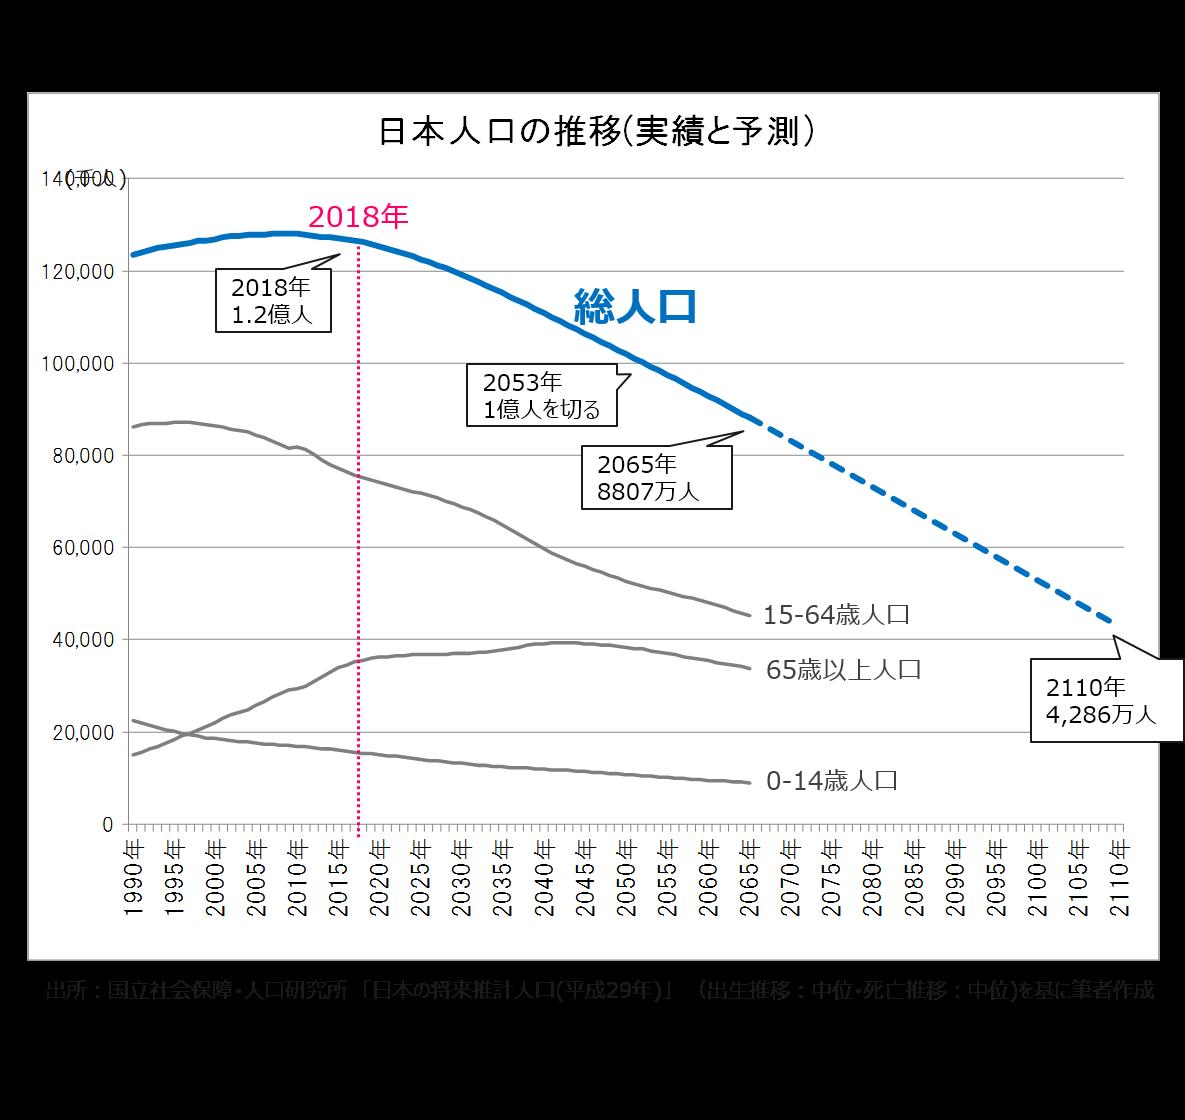 f:id:data-h-products:20200407180627p:plain